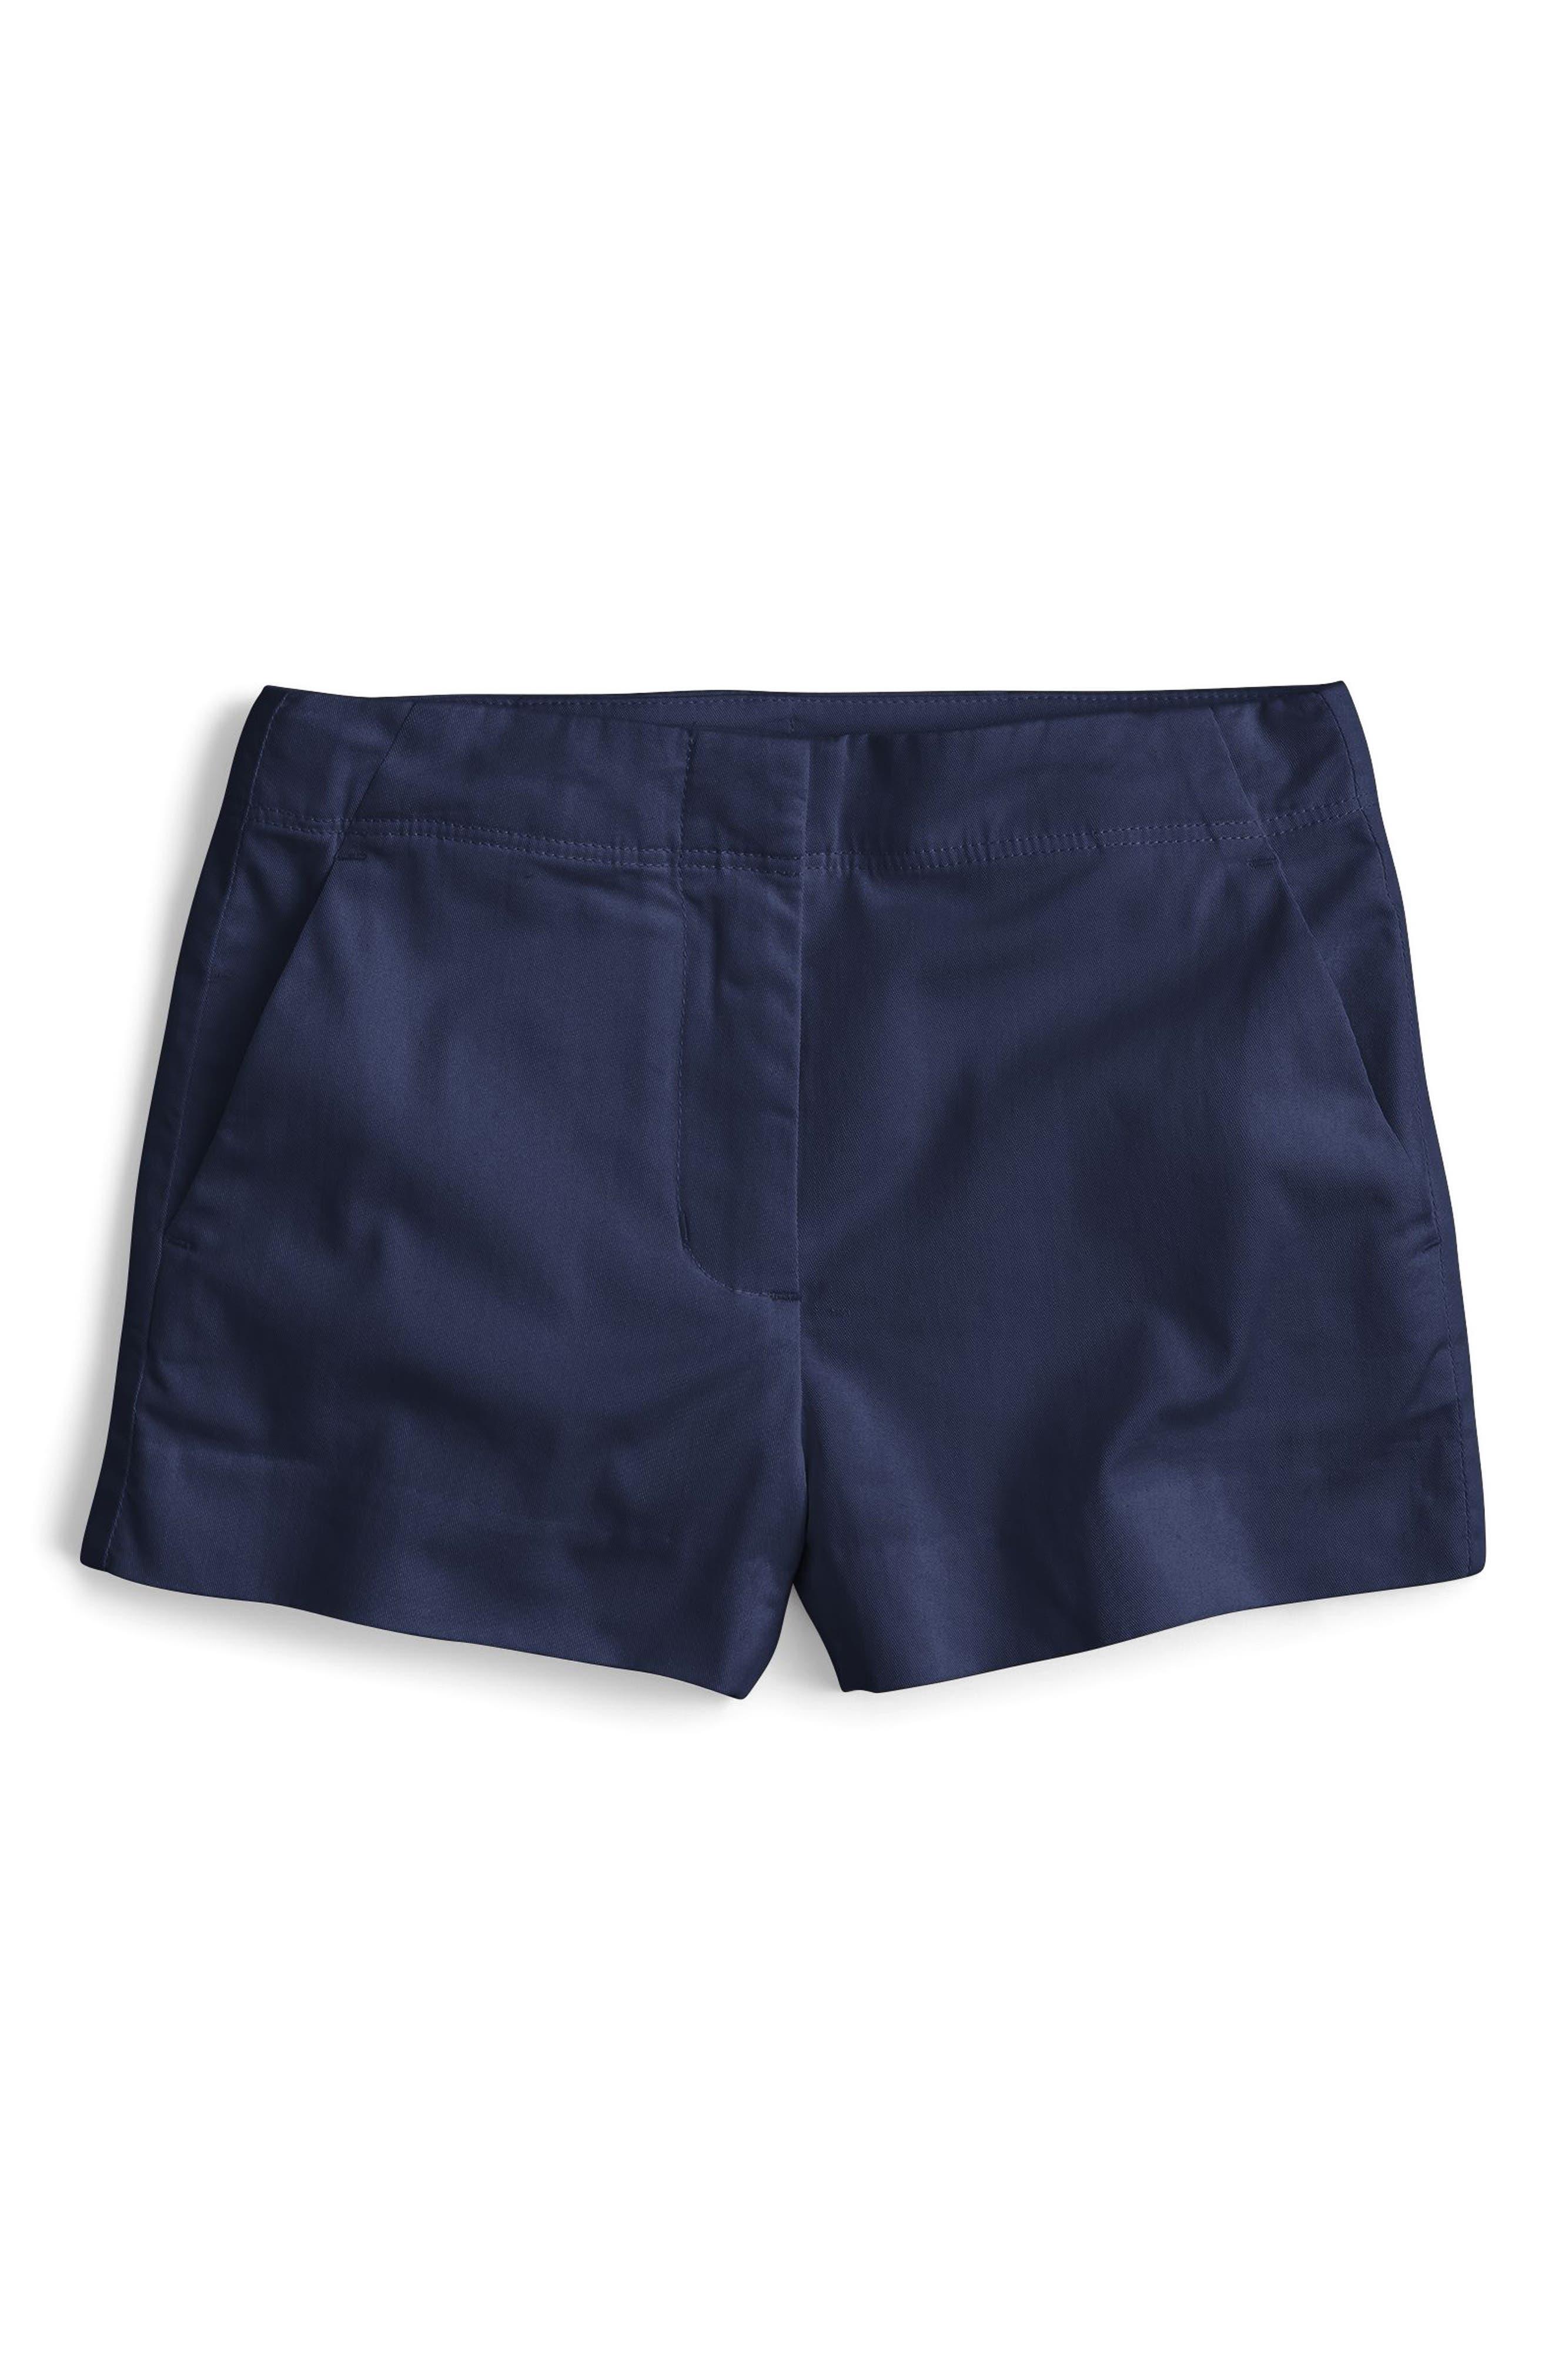 Frankie Stretch Cotton Shorts,                             Main thumbnail 1, color,                             Indigo